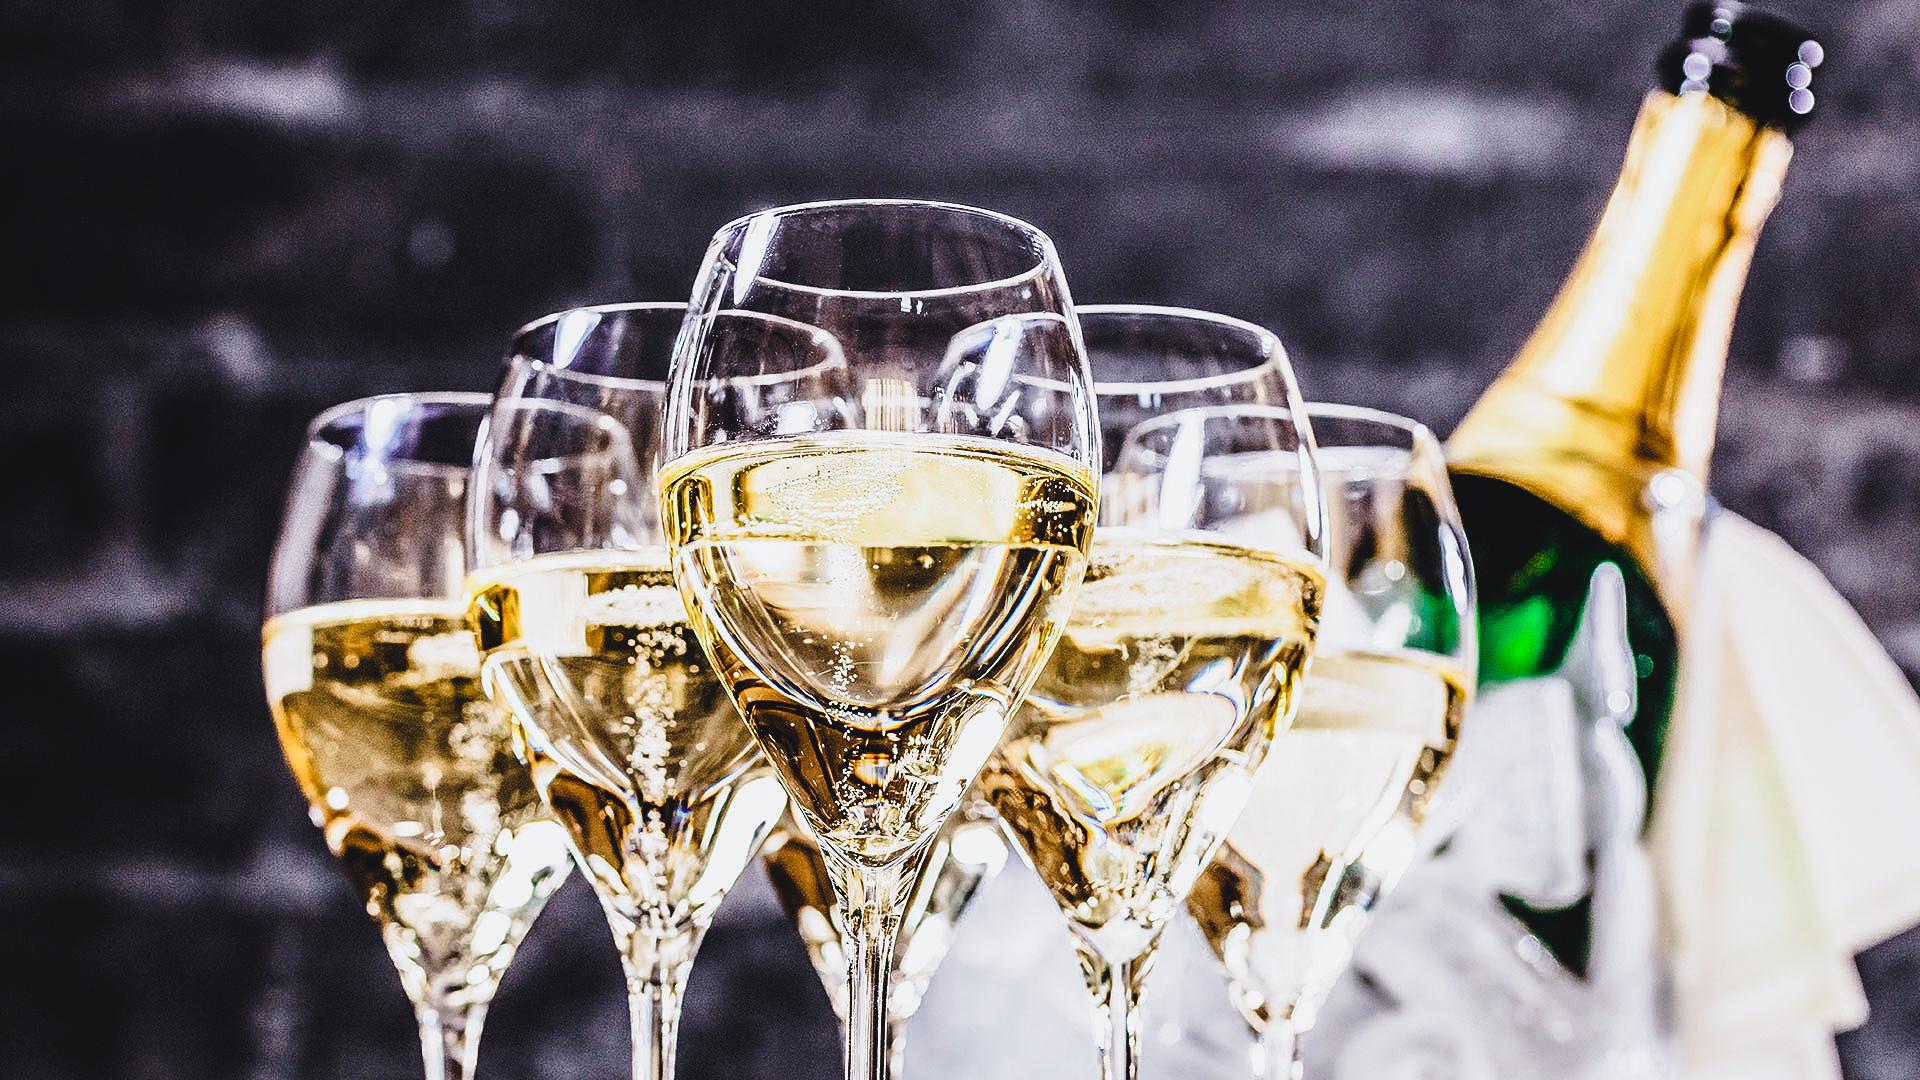 Best Champagne Bottles To Pop Open